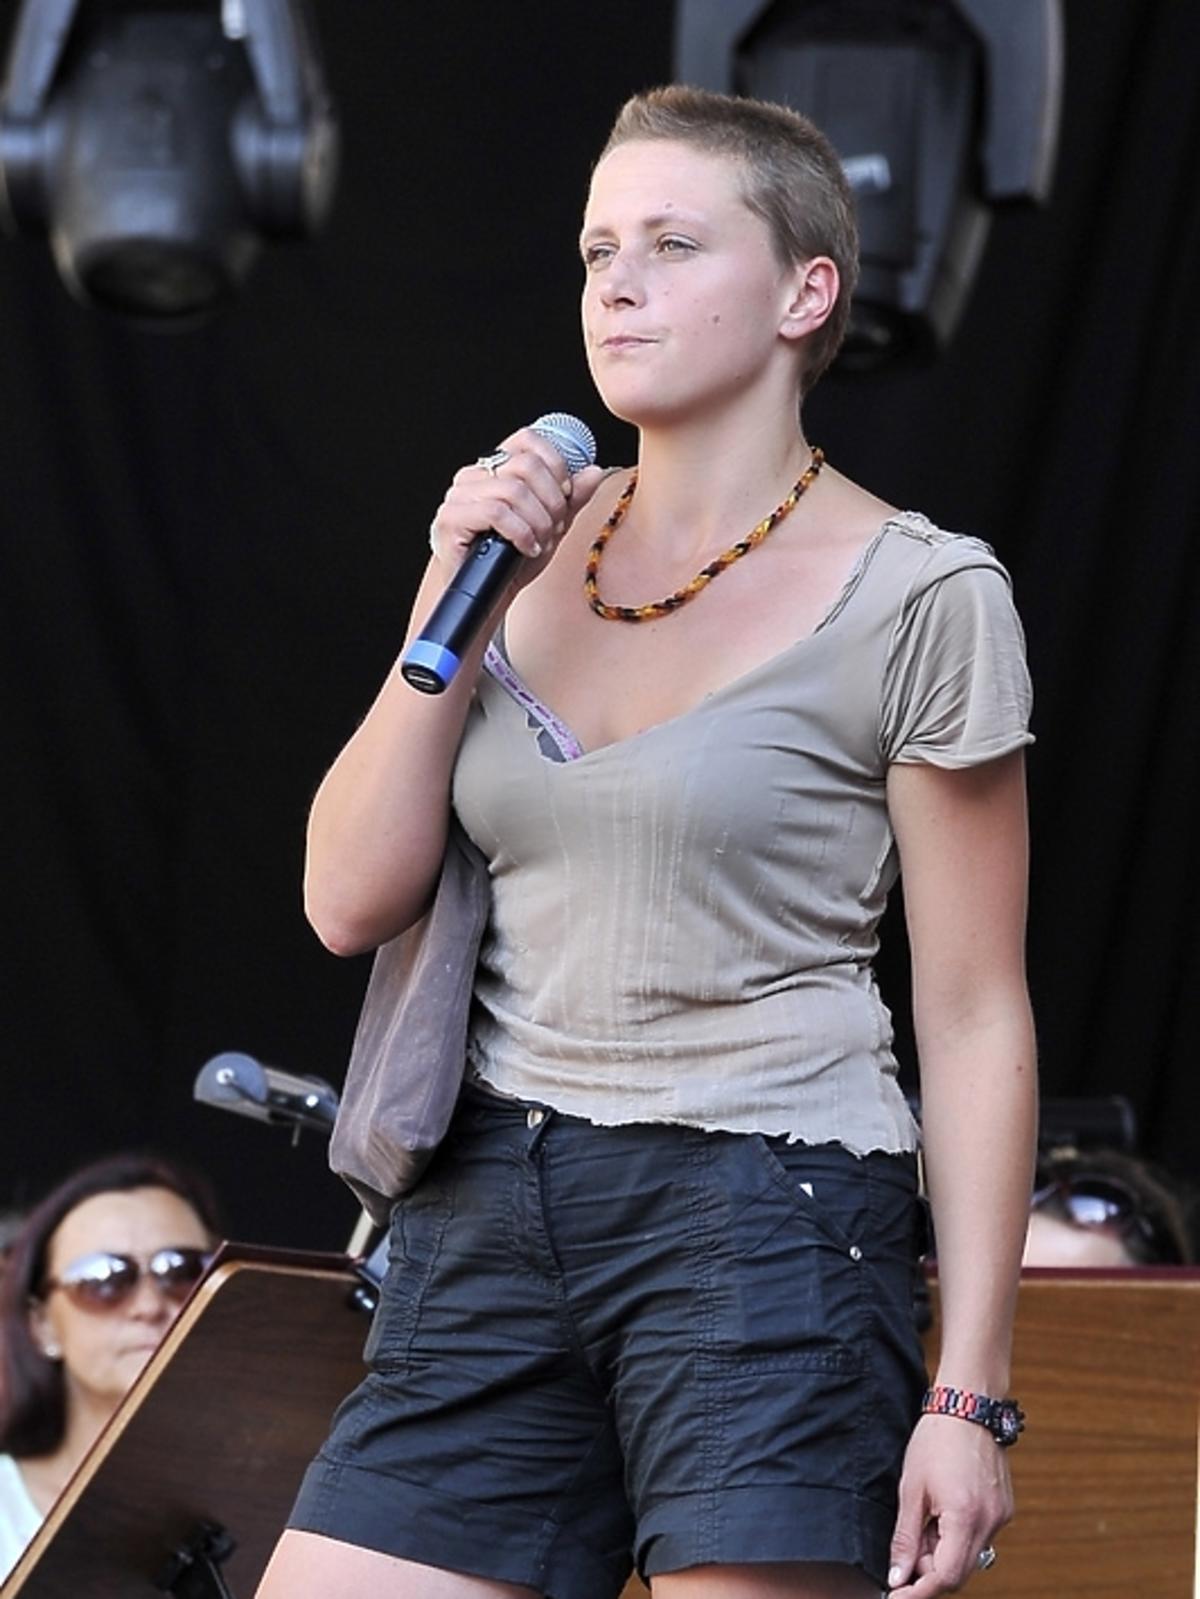 Natalia Sikora na Festiwalu Piosenki i Ballady Filmowej w Toruniu